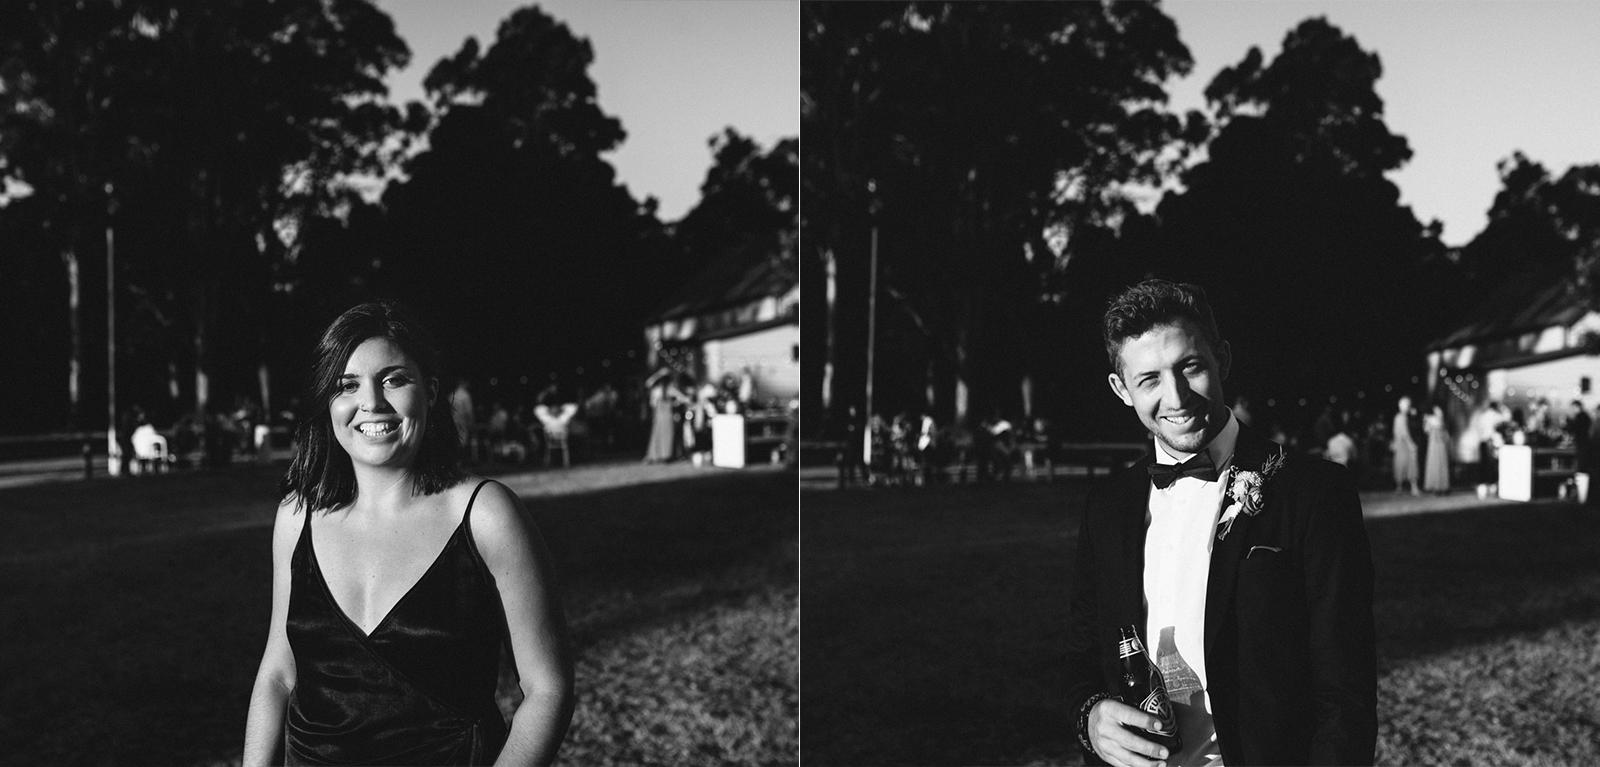 ZD-Melbourne Wedding Photographer-Dean Raphael-119.jpg